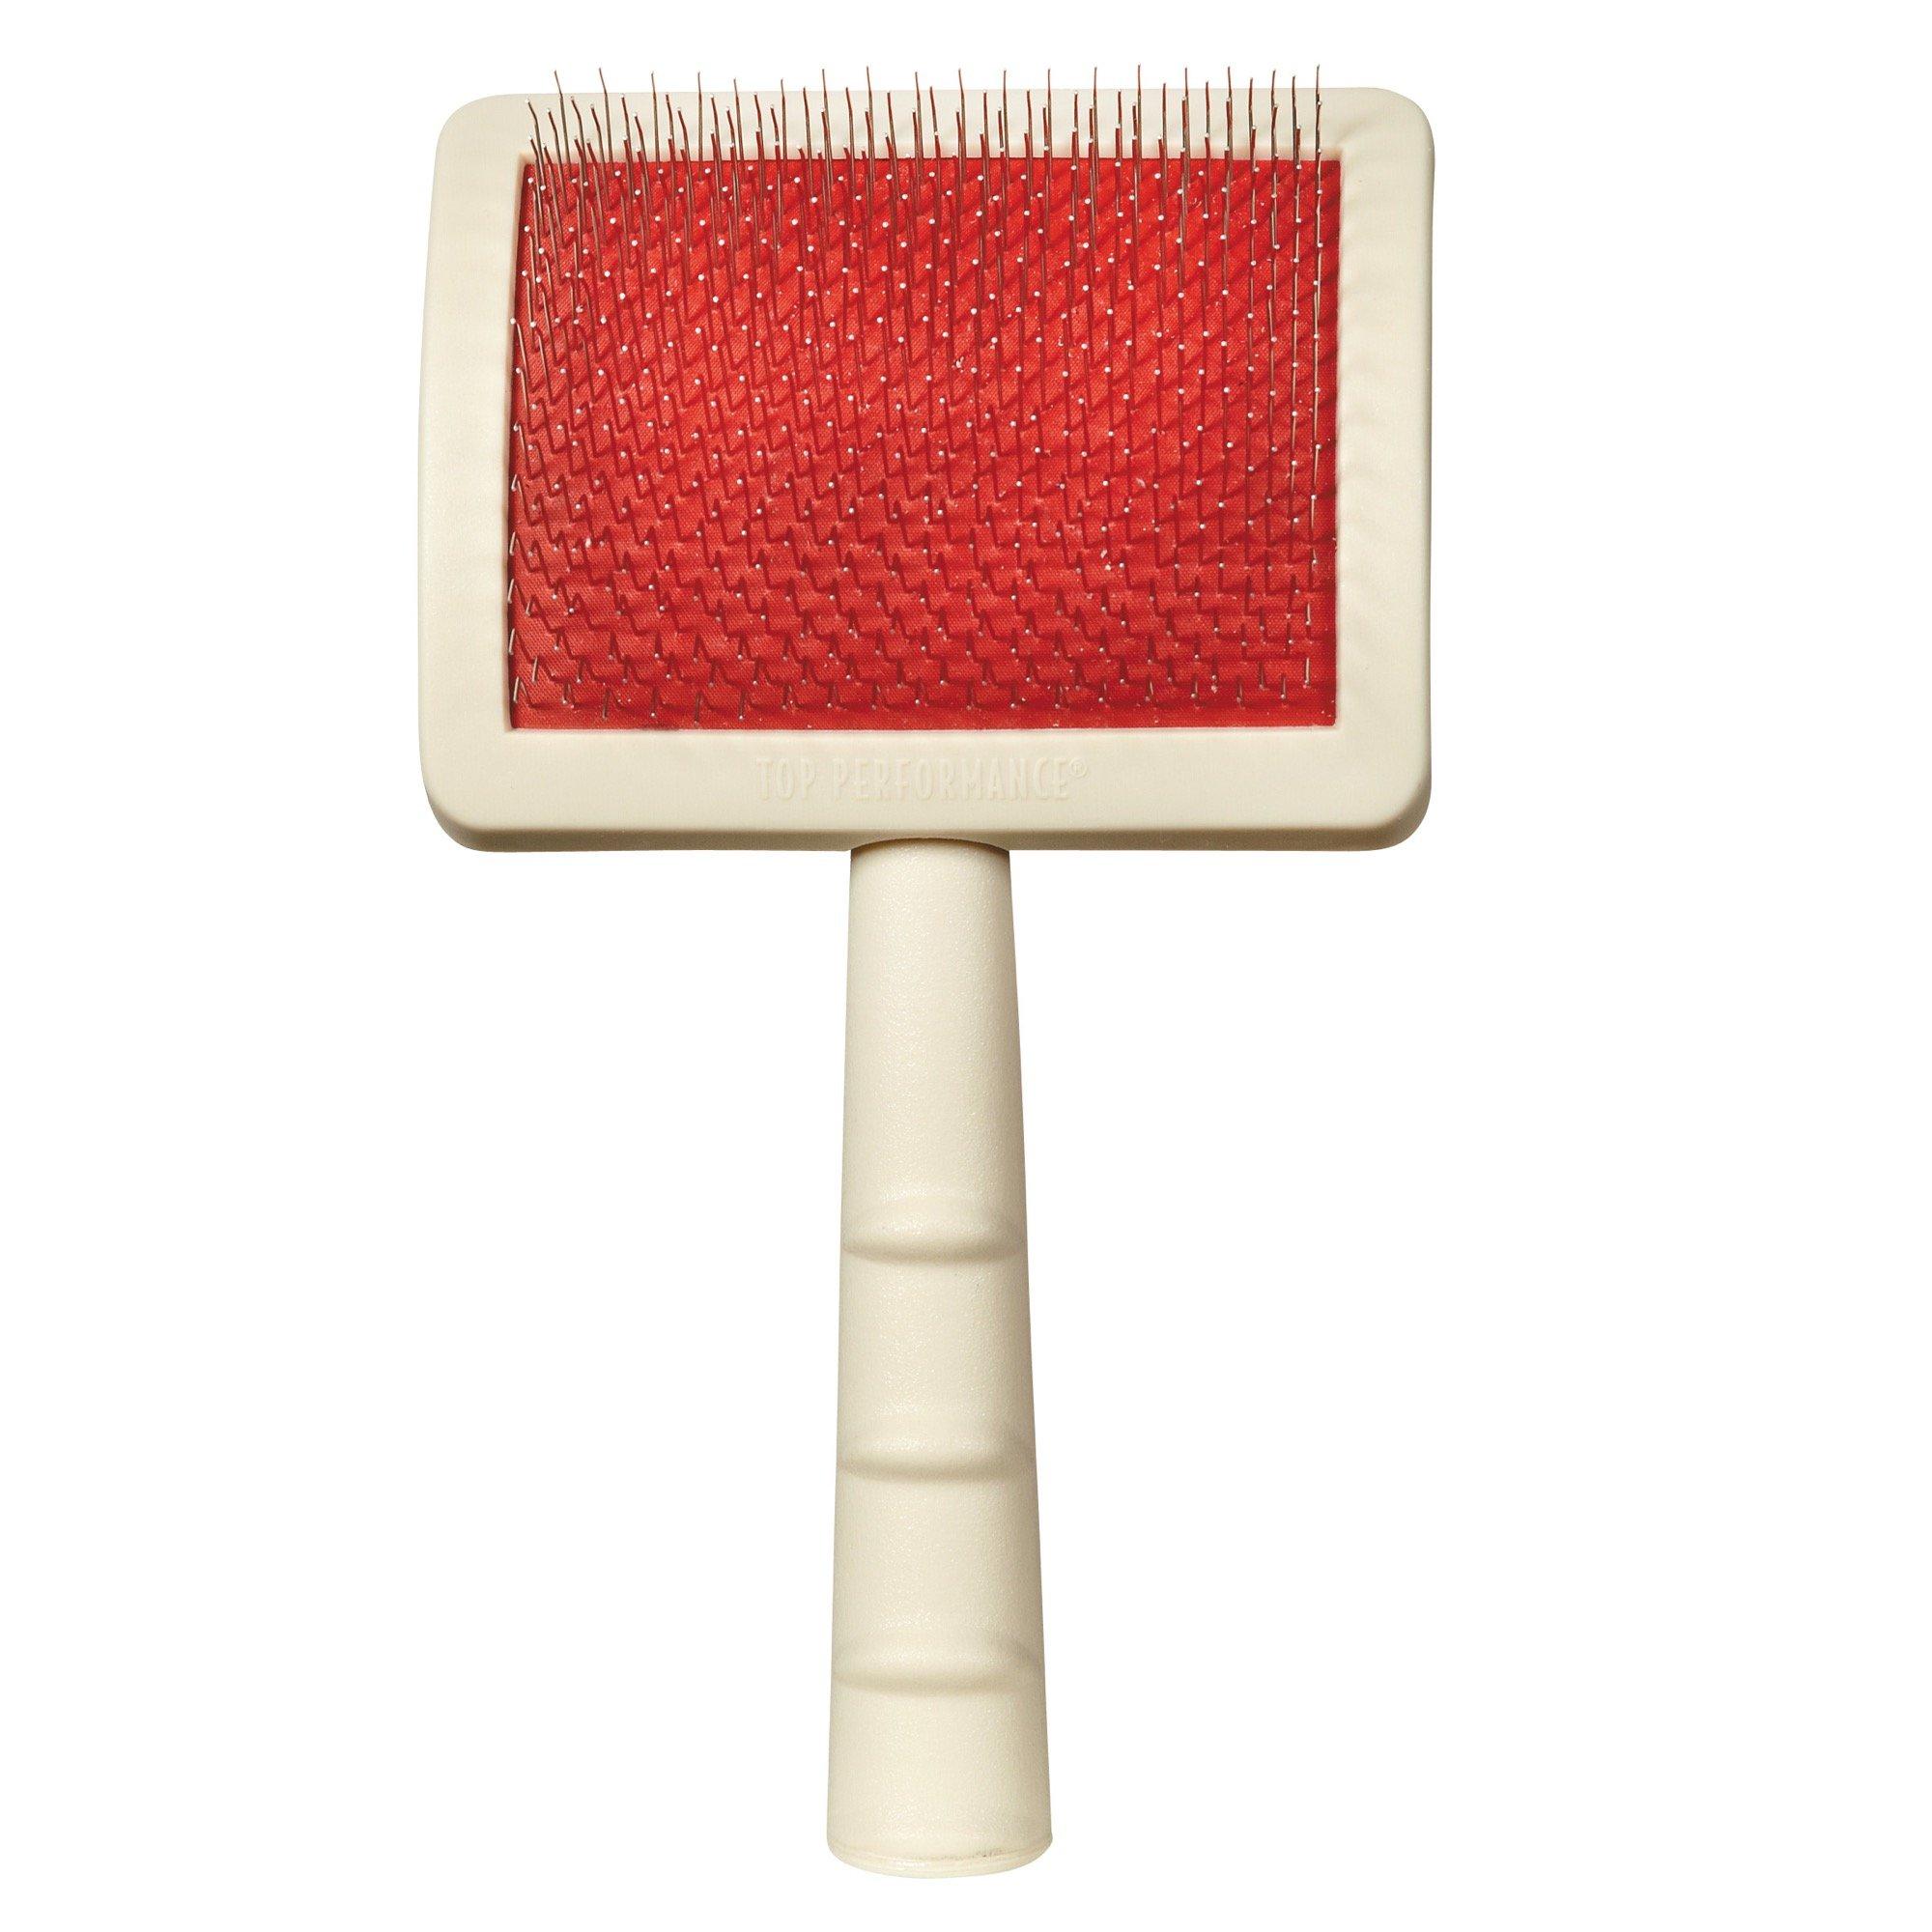 Master Grooming Tools Universal Pet Large Slicker Brush by Master Grooming